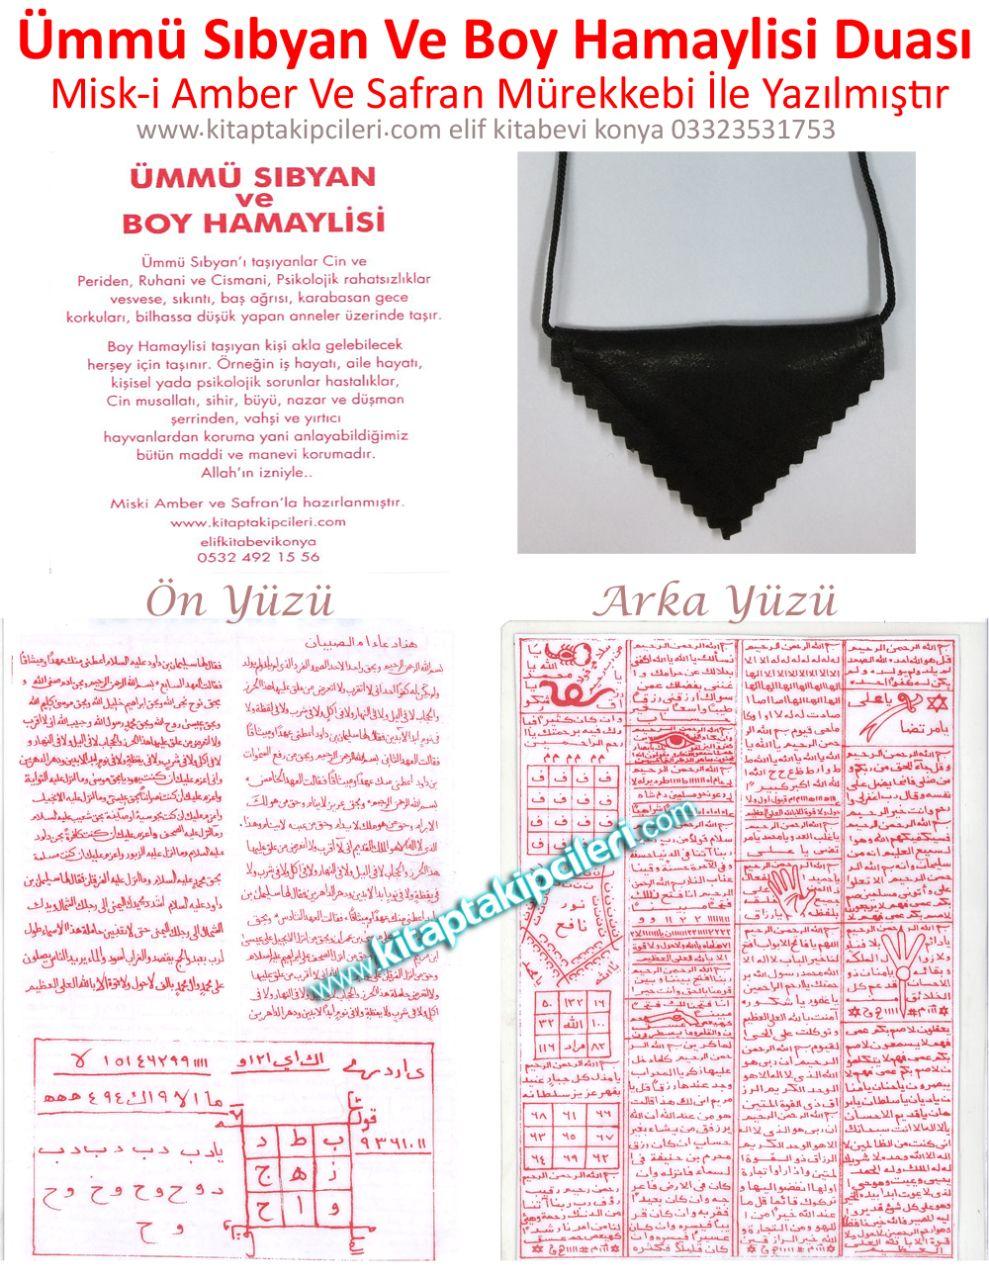 Learn To Read Quran Online Noorani Qaida Learn Arabic Alphabet Arabic Alphabet For Kids Learn Quran